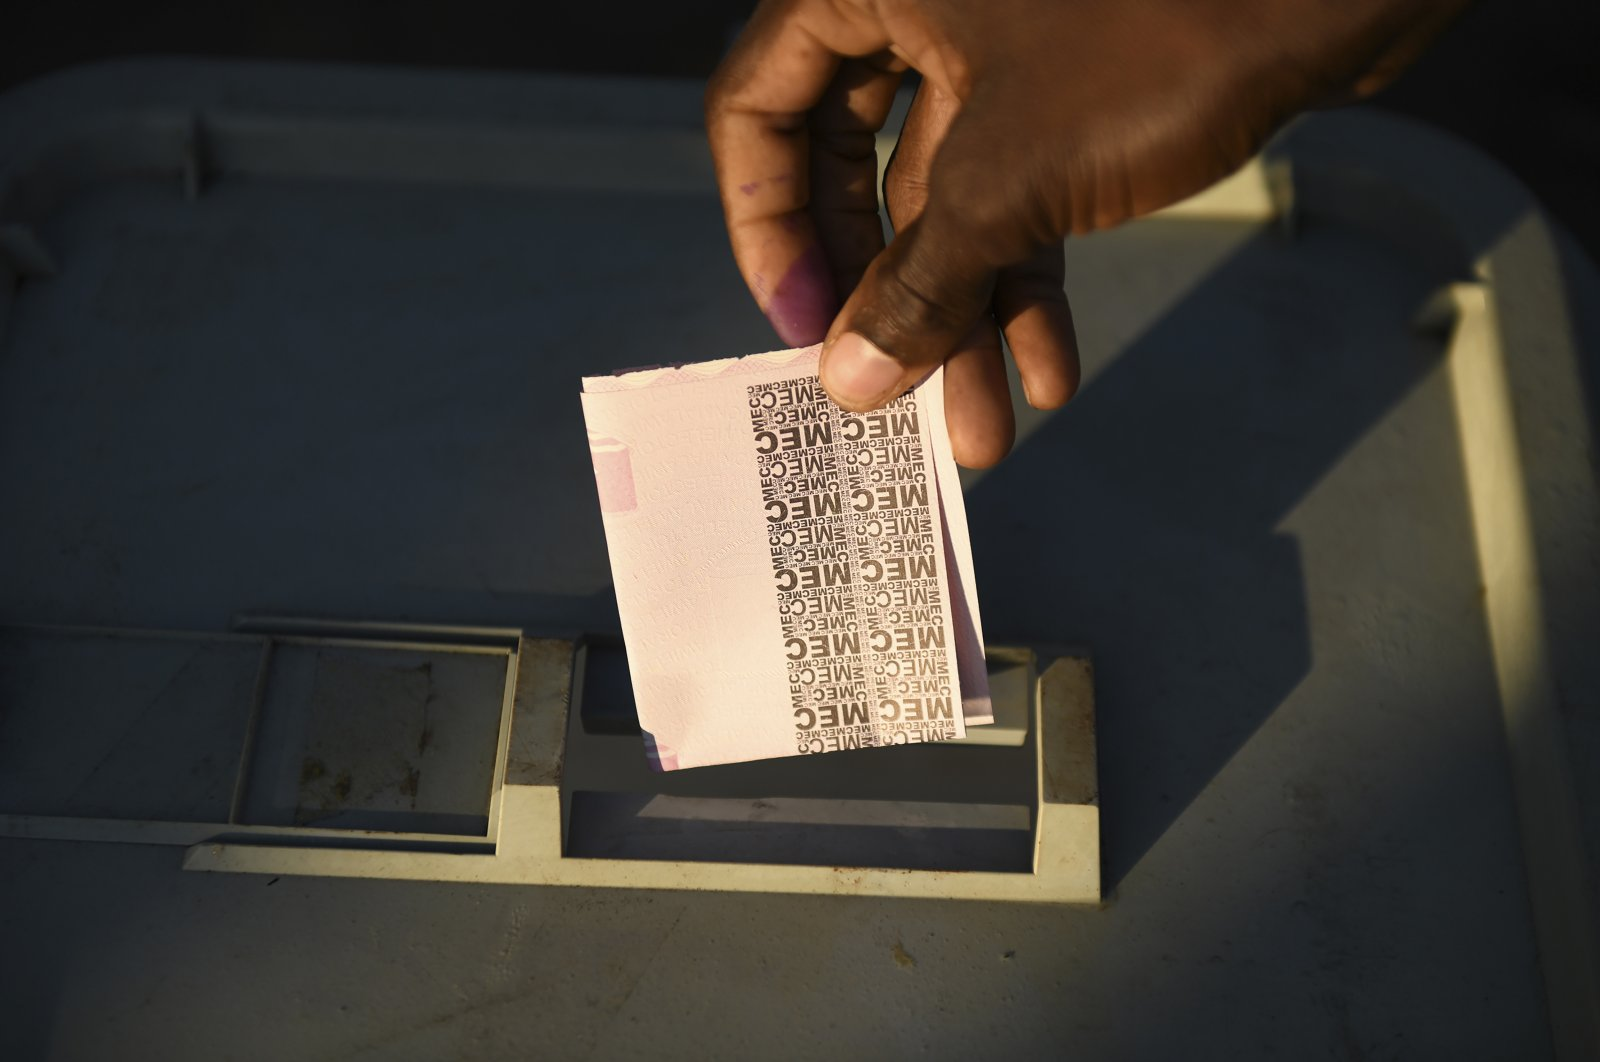 Residents queue to cast their votes in Blantyre, Malawi, June 23 2020. (AP Photo/Thoko Chikondi)